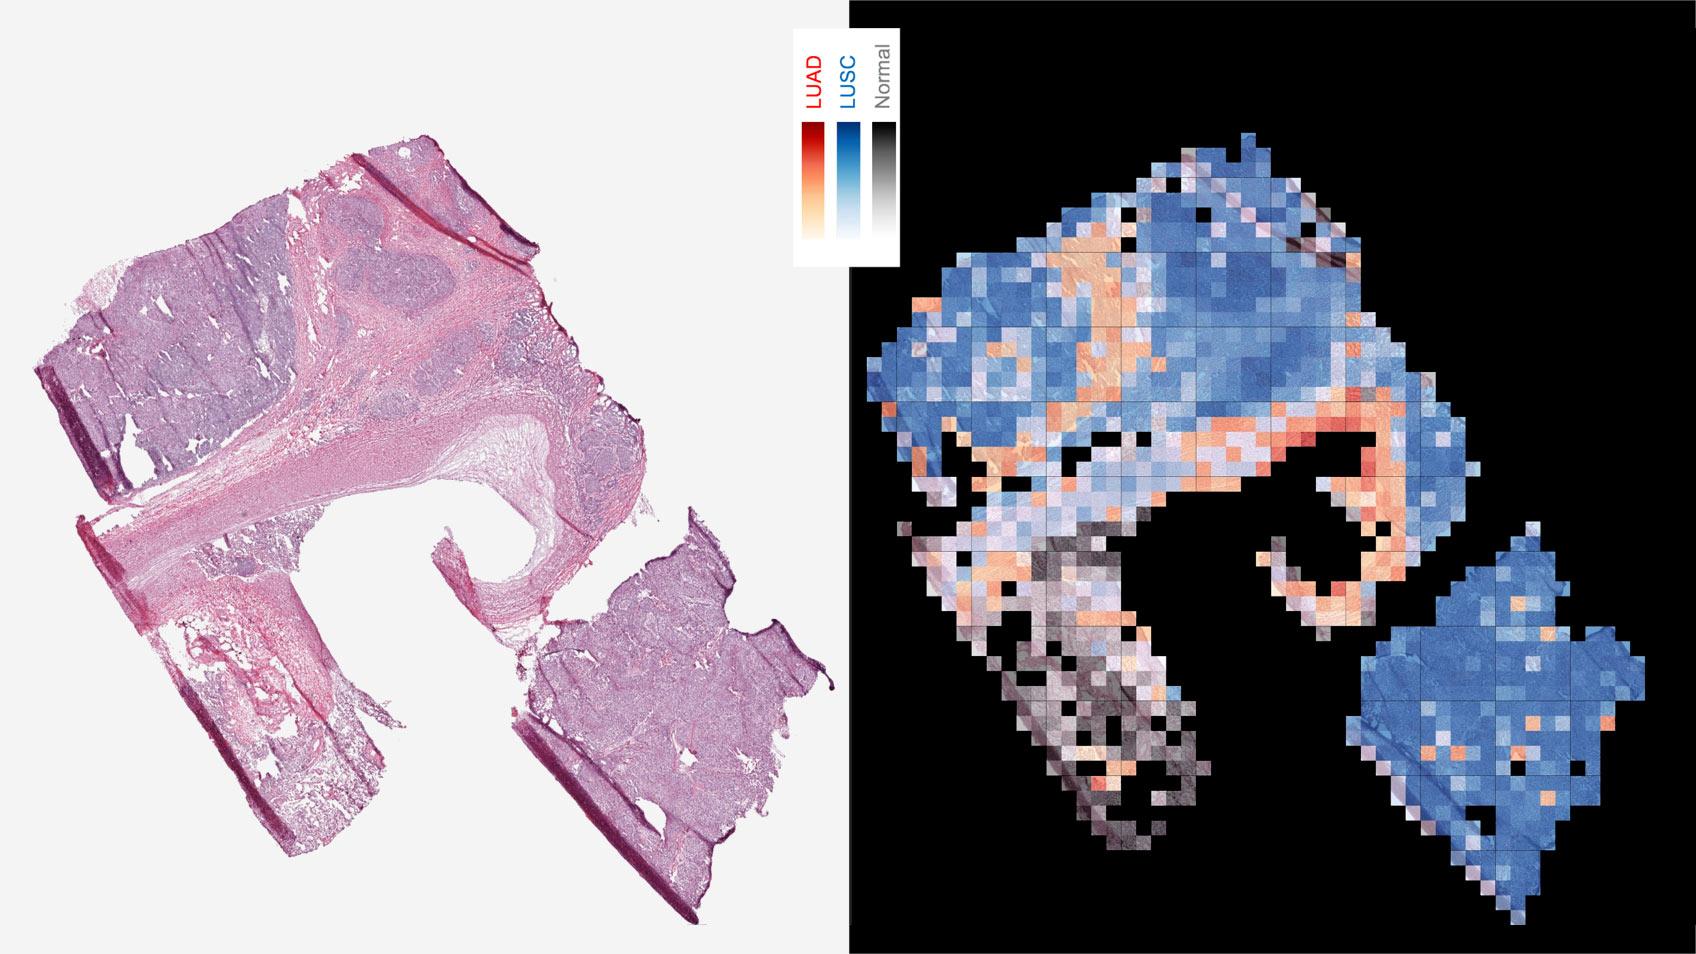 Google AI 最新應用,成功辨識腫瘤突變影像